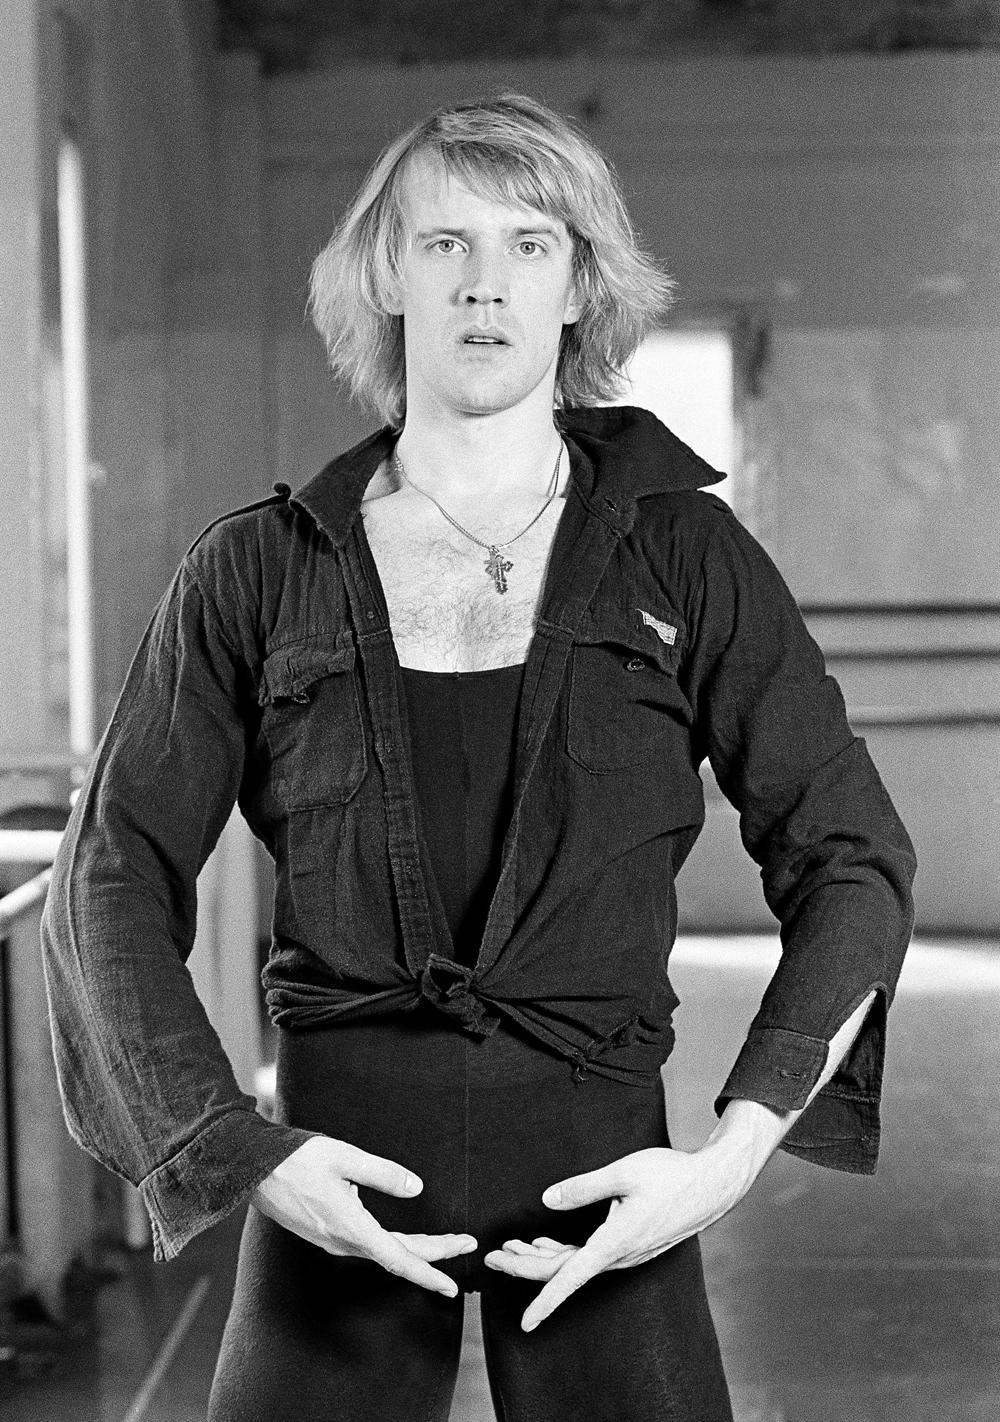 Balshoi Ballet star Alexander Godunov gestures during a press conference in New York on August 29, 1979. Source: AP